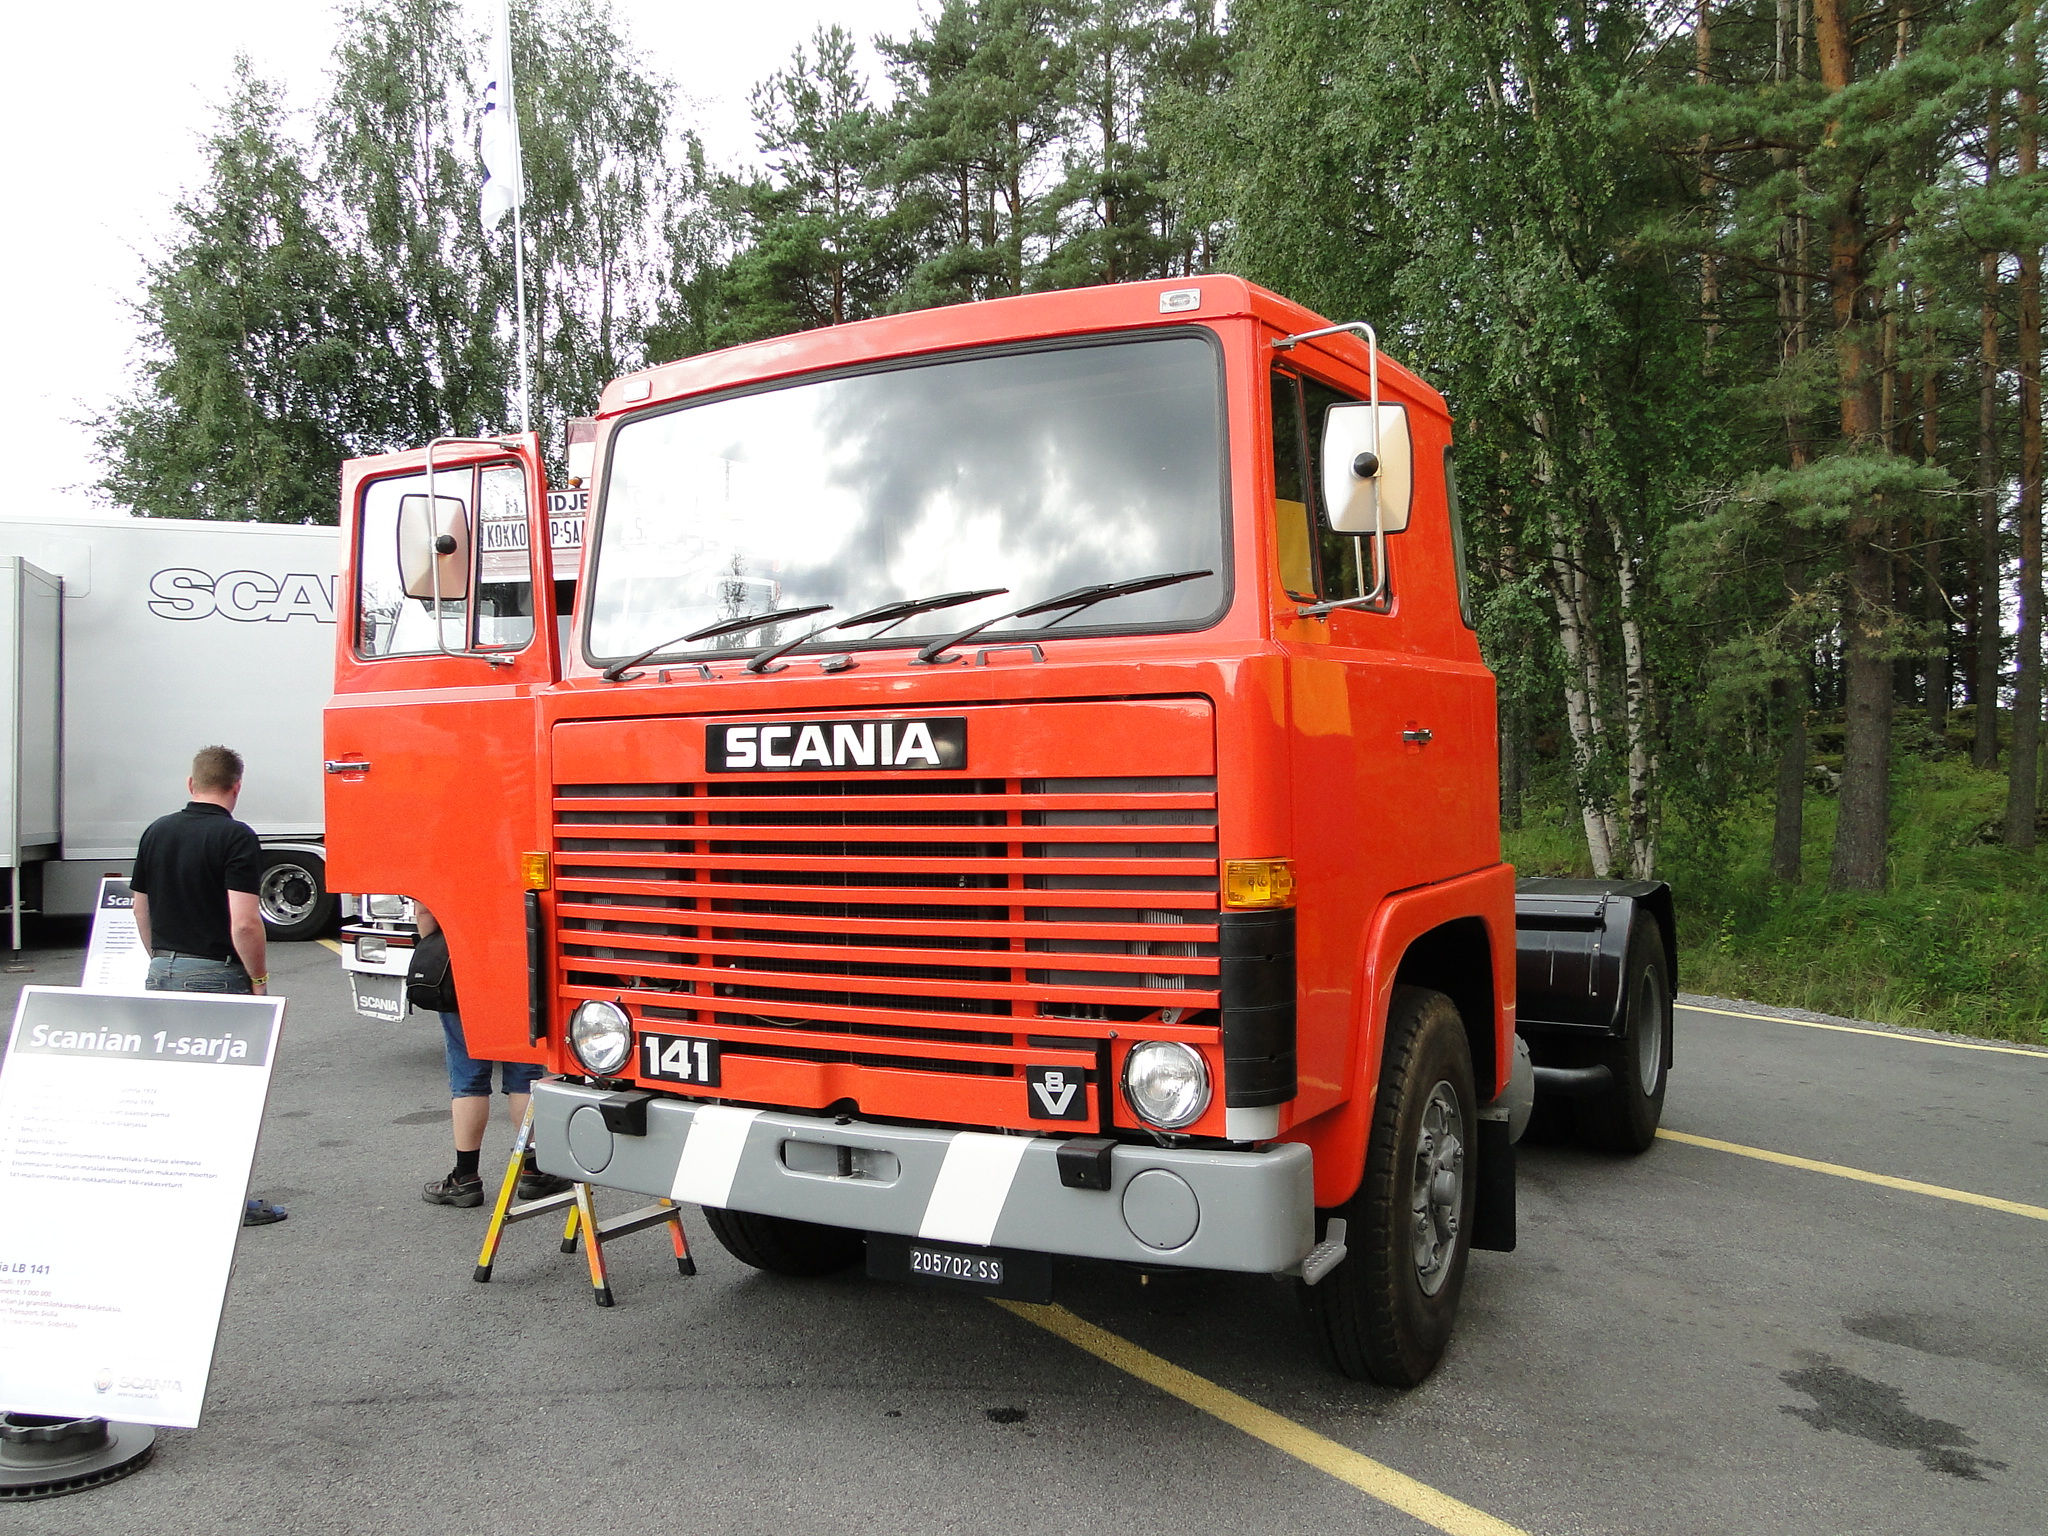 File Scania Lb 141 Jpg Wikimedia Commons